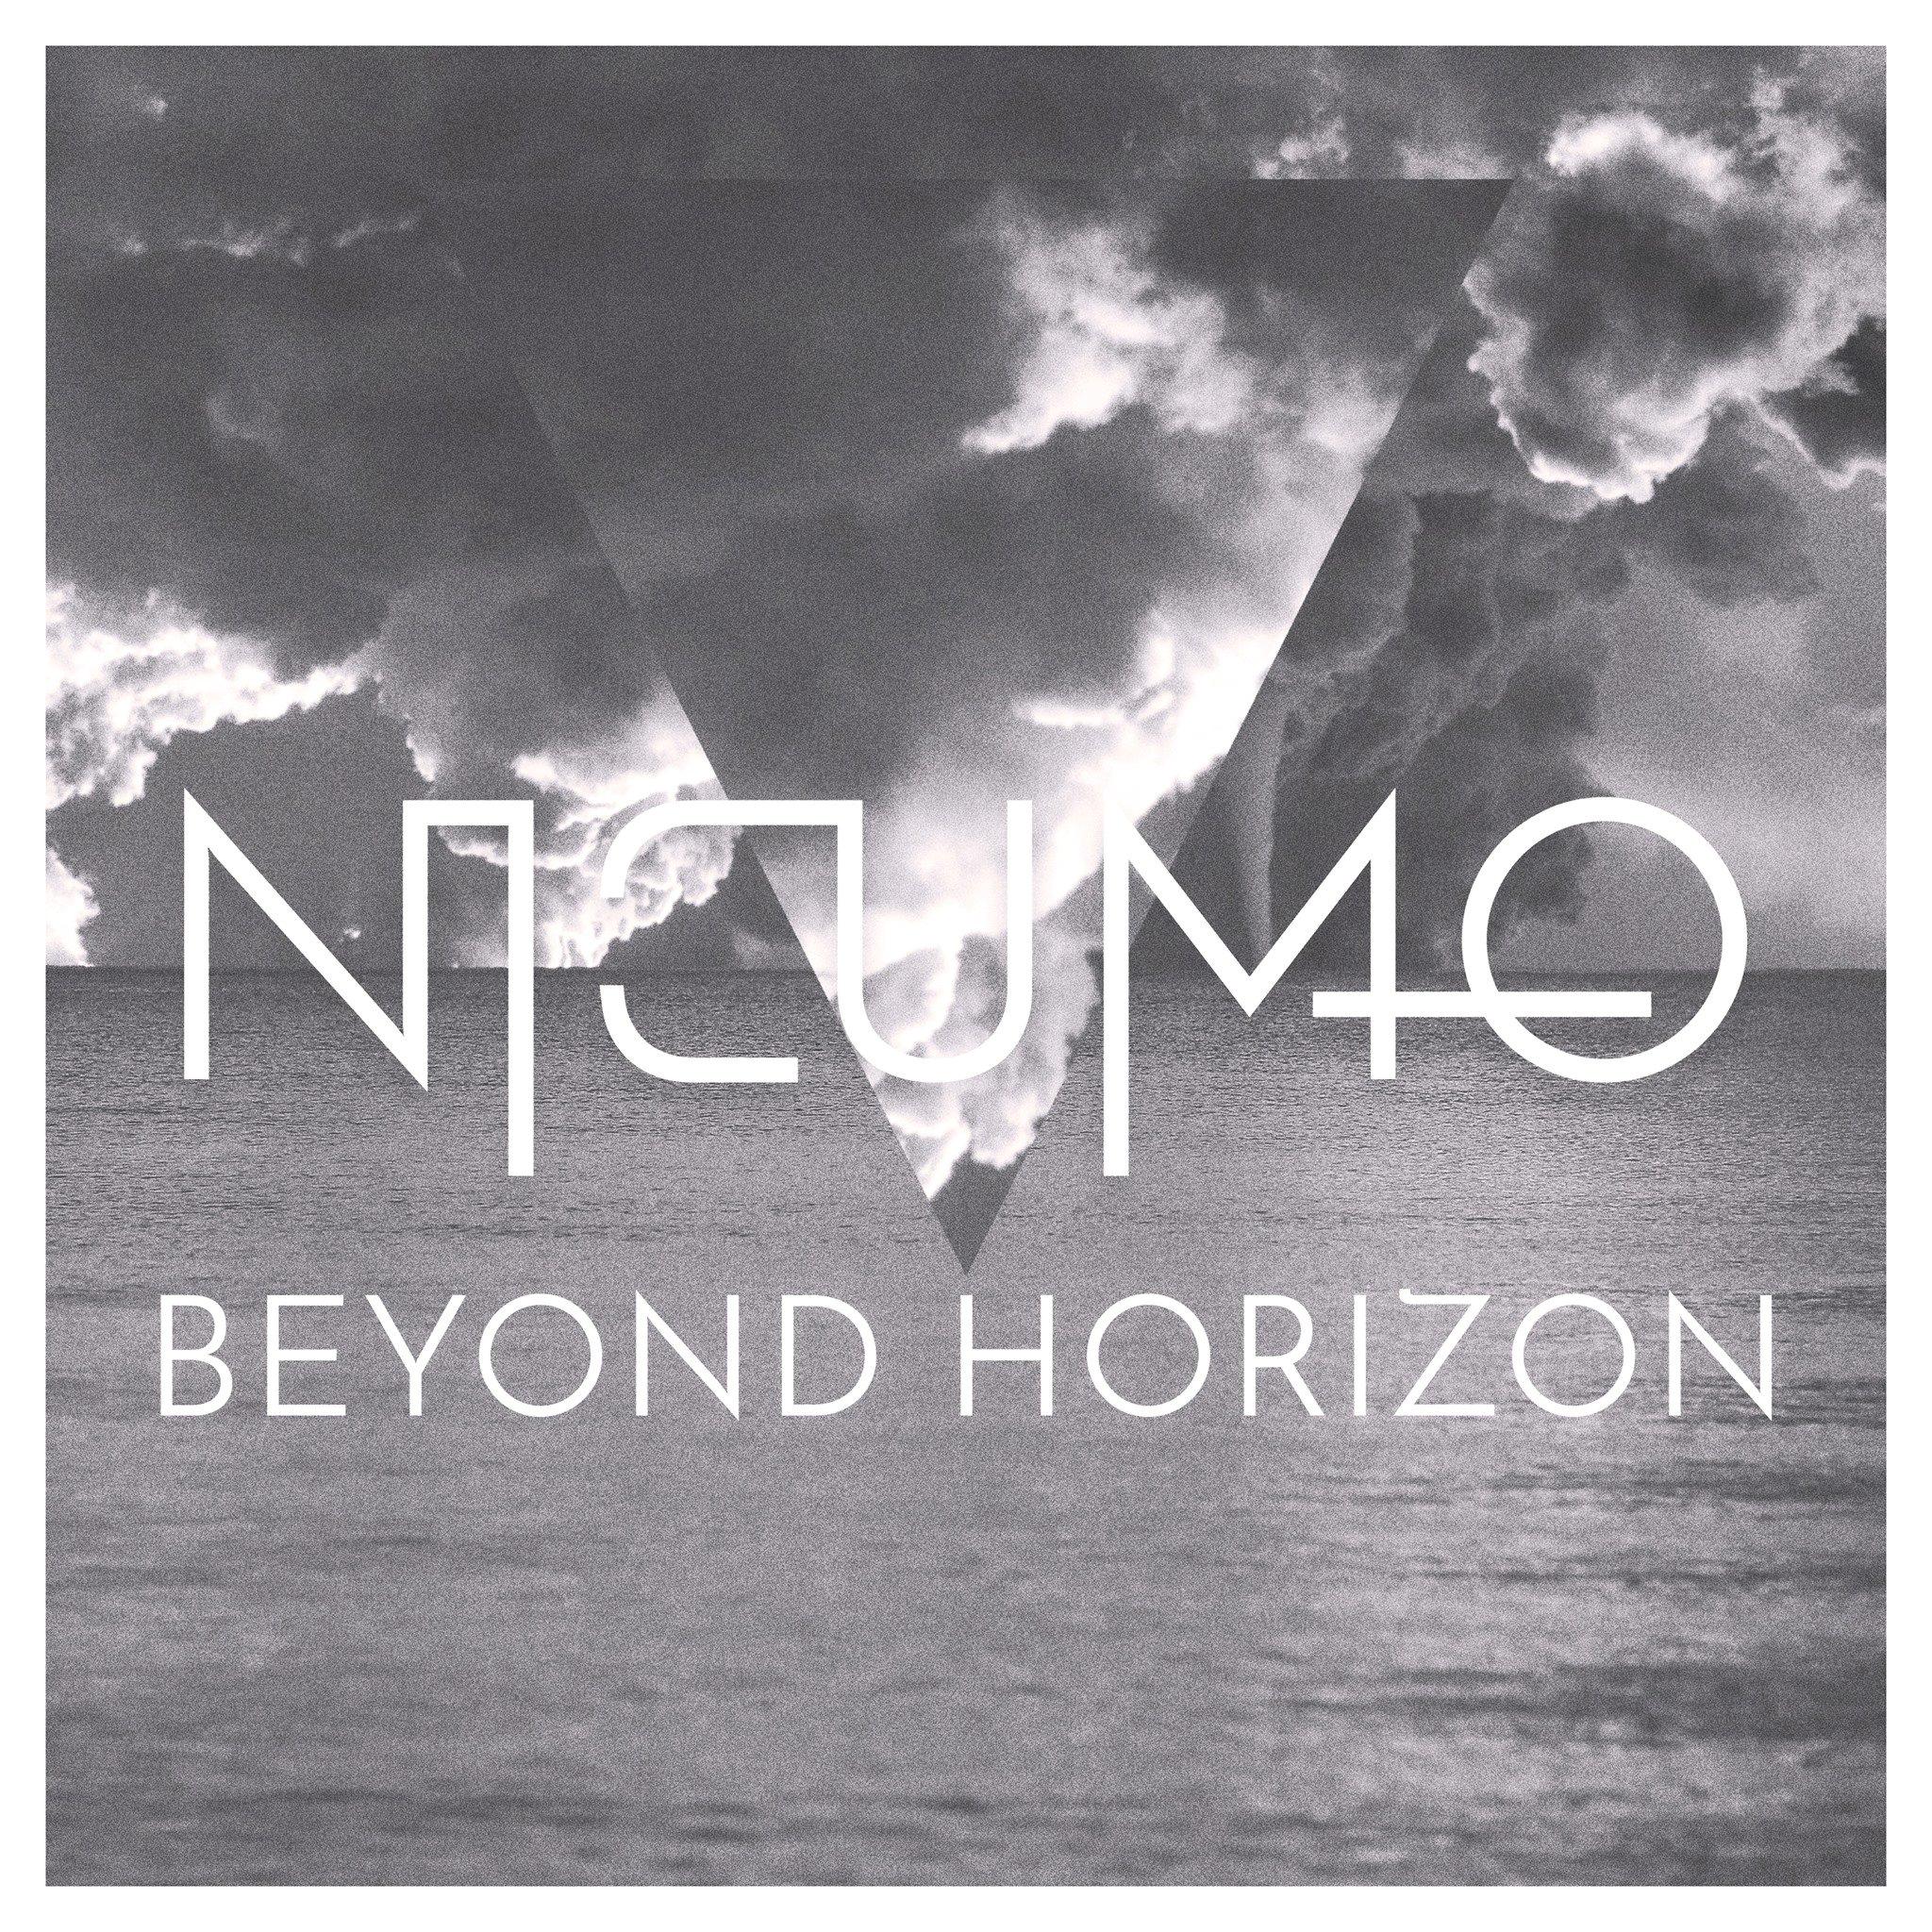 Nicumo - Beyond Horizon - Promo